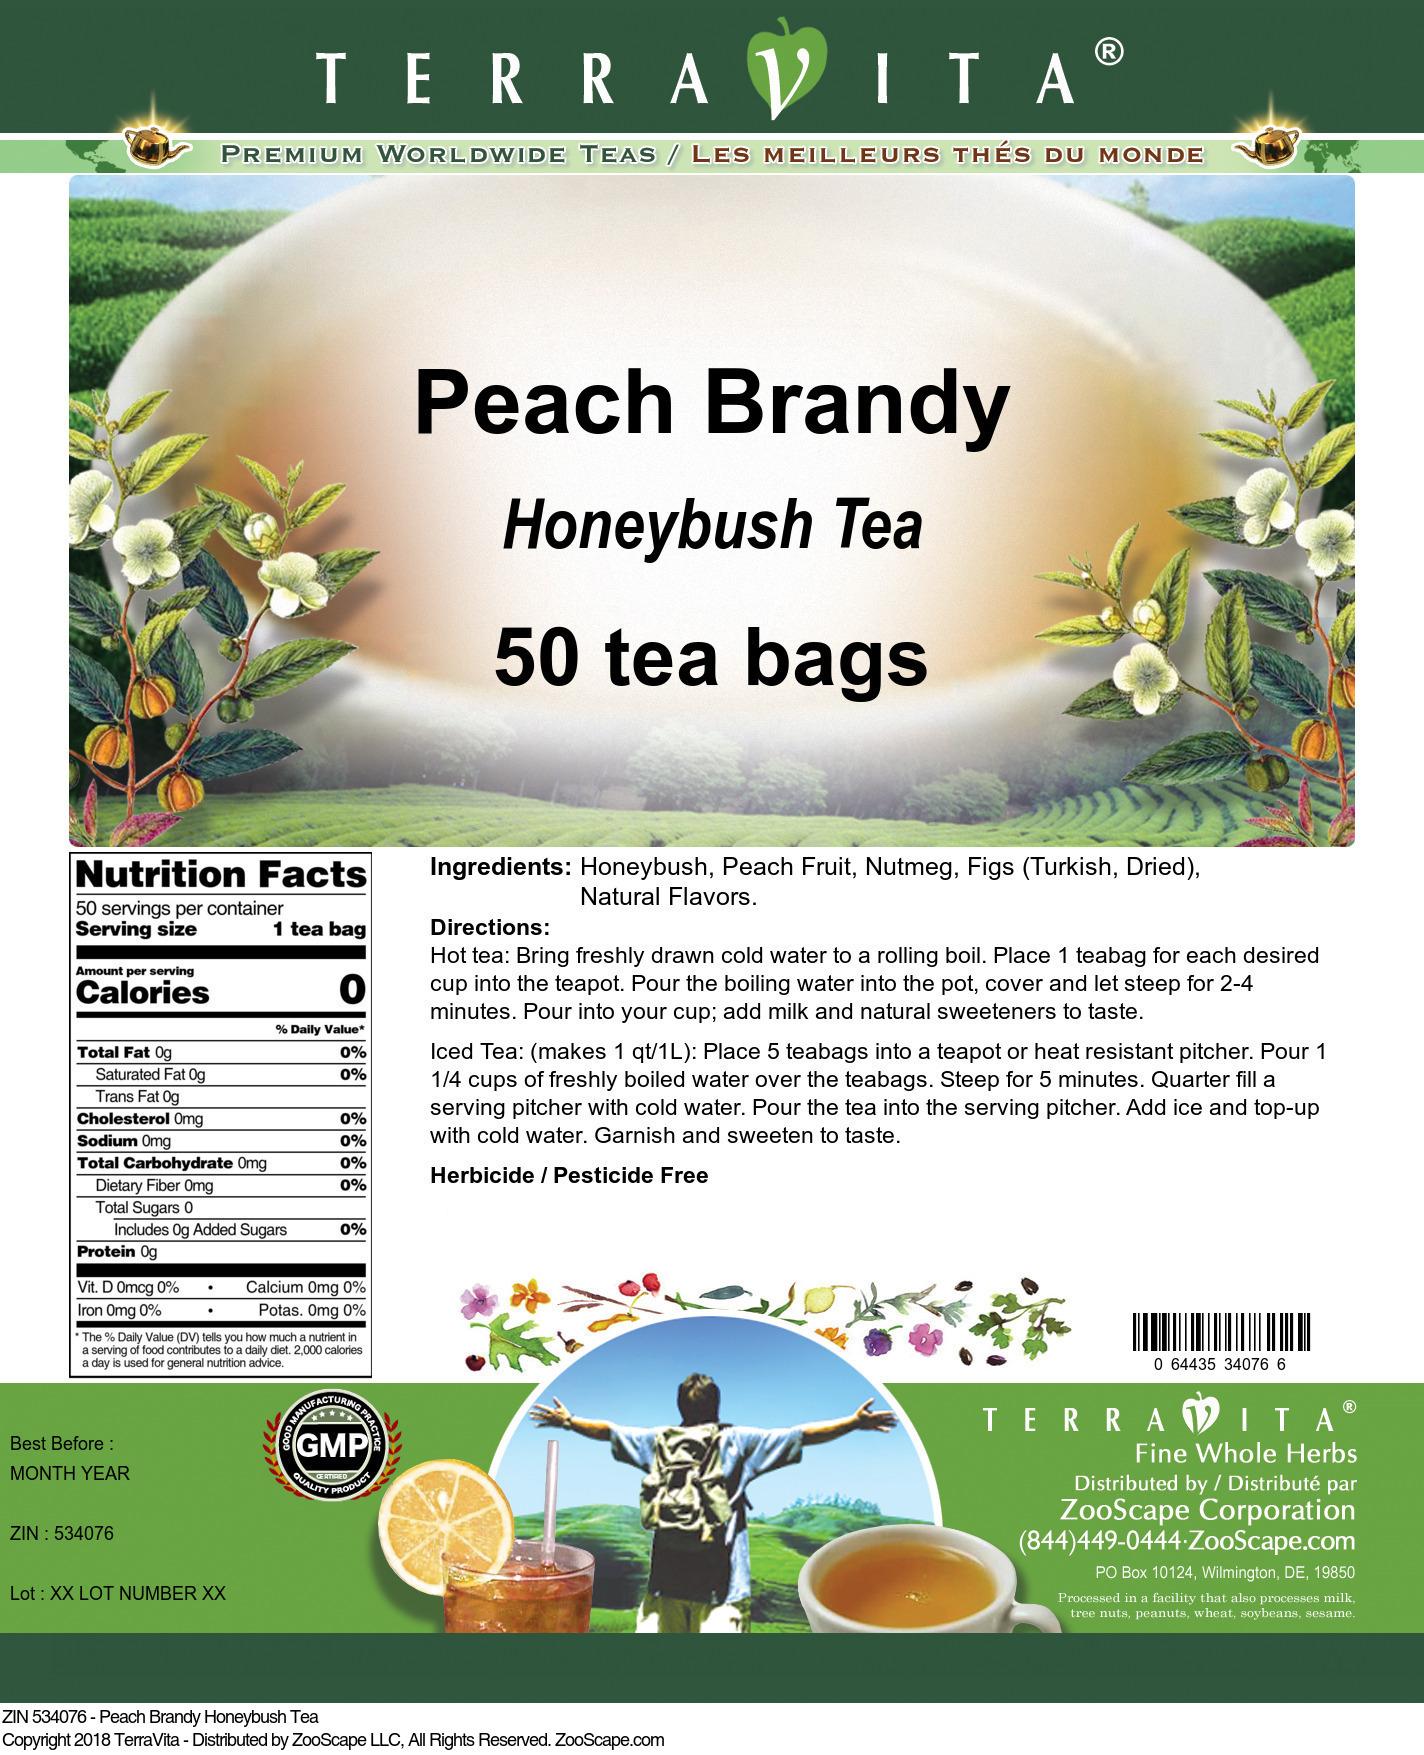 Peach Brandy Honeybush Tea